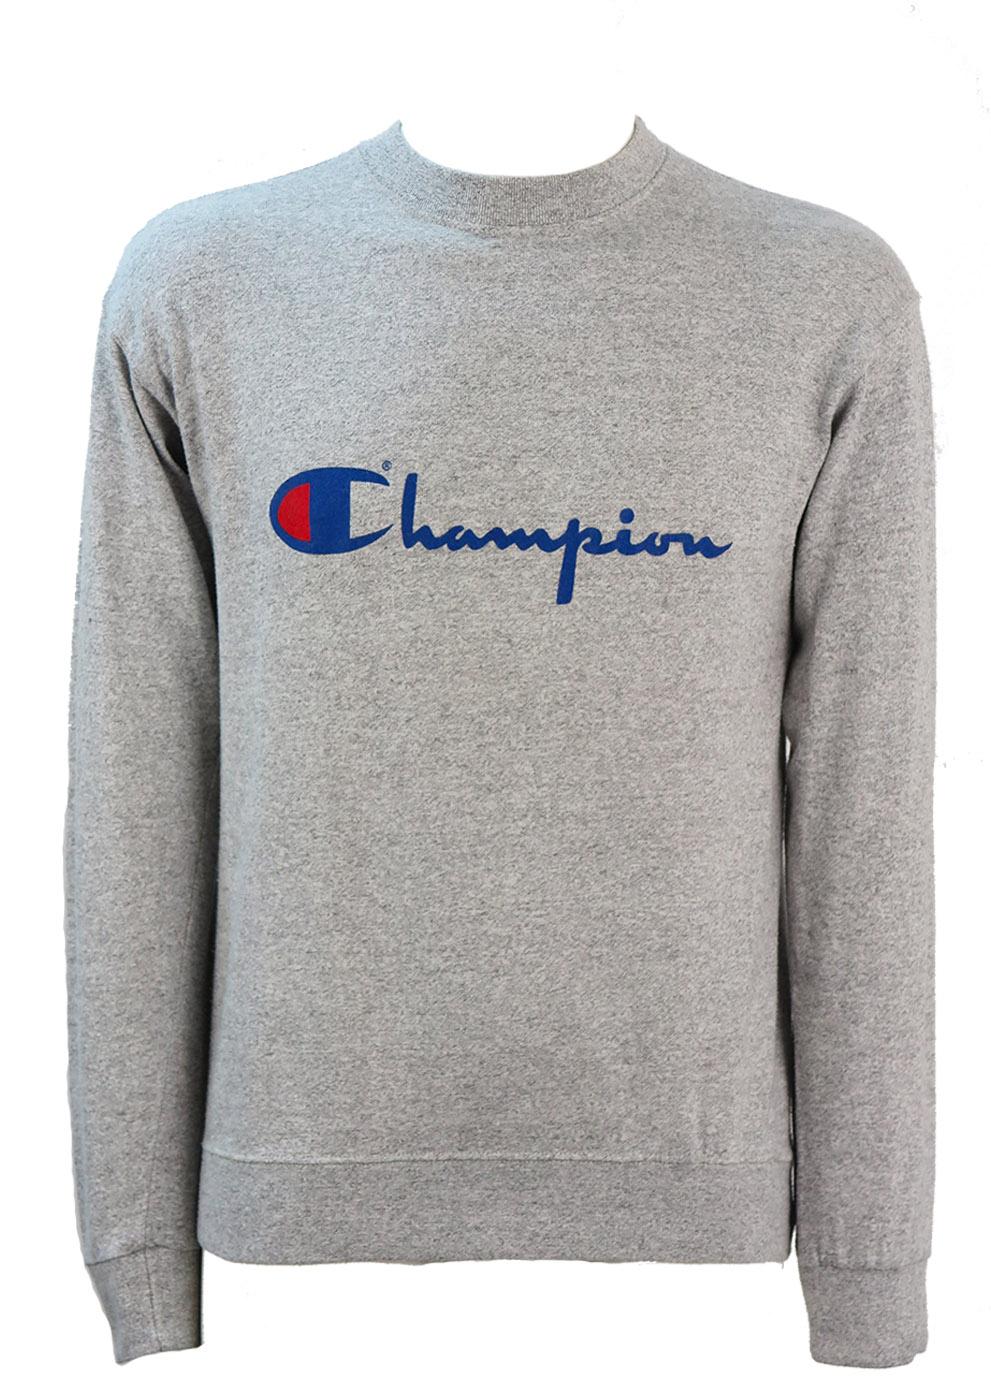 bc5f65df6 Lightweight Grey Champion Top in a Sweatshirt Style – S/M – Reign ...